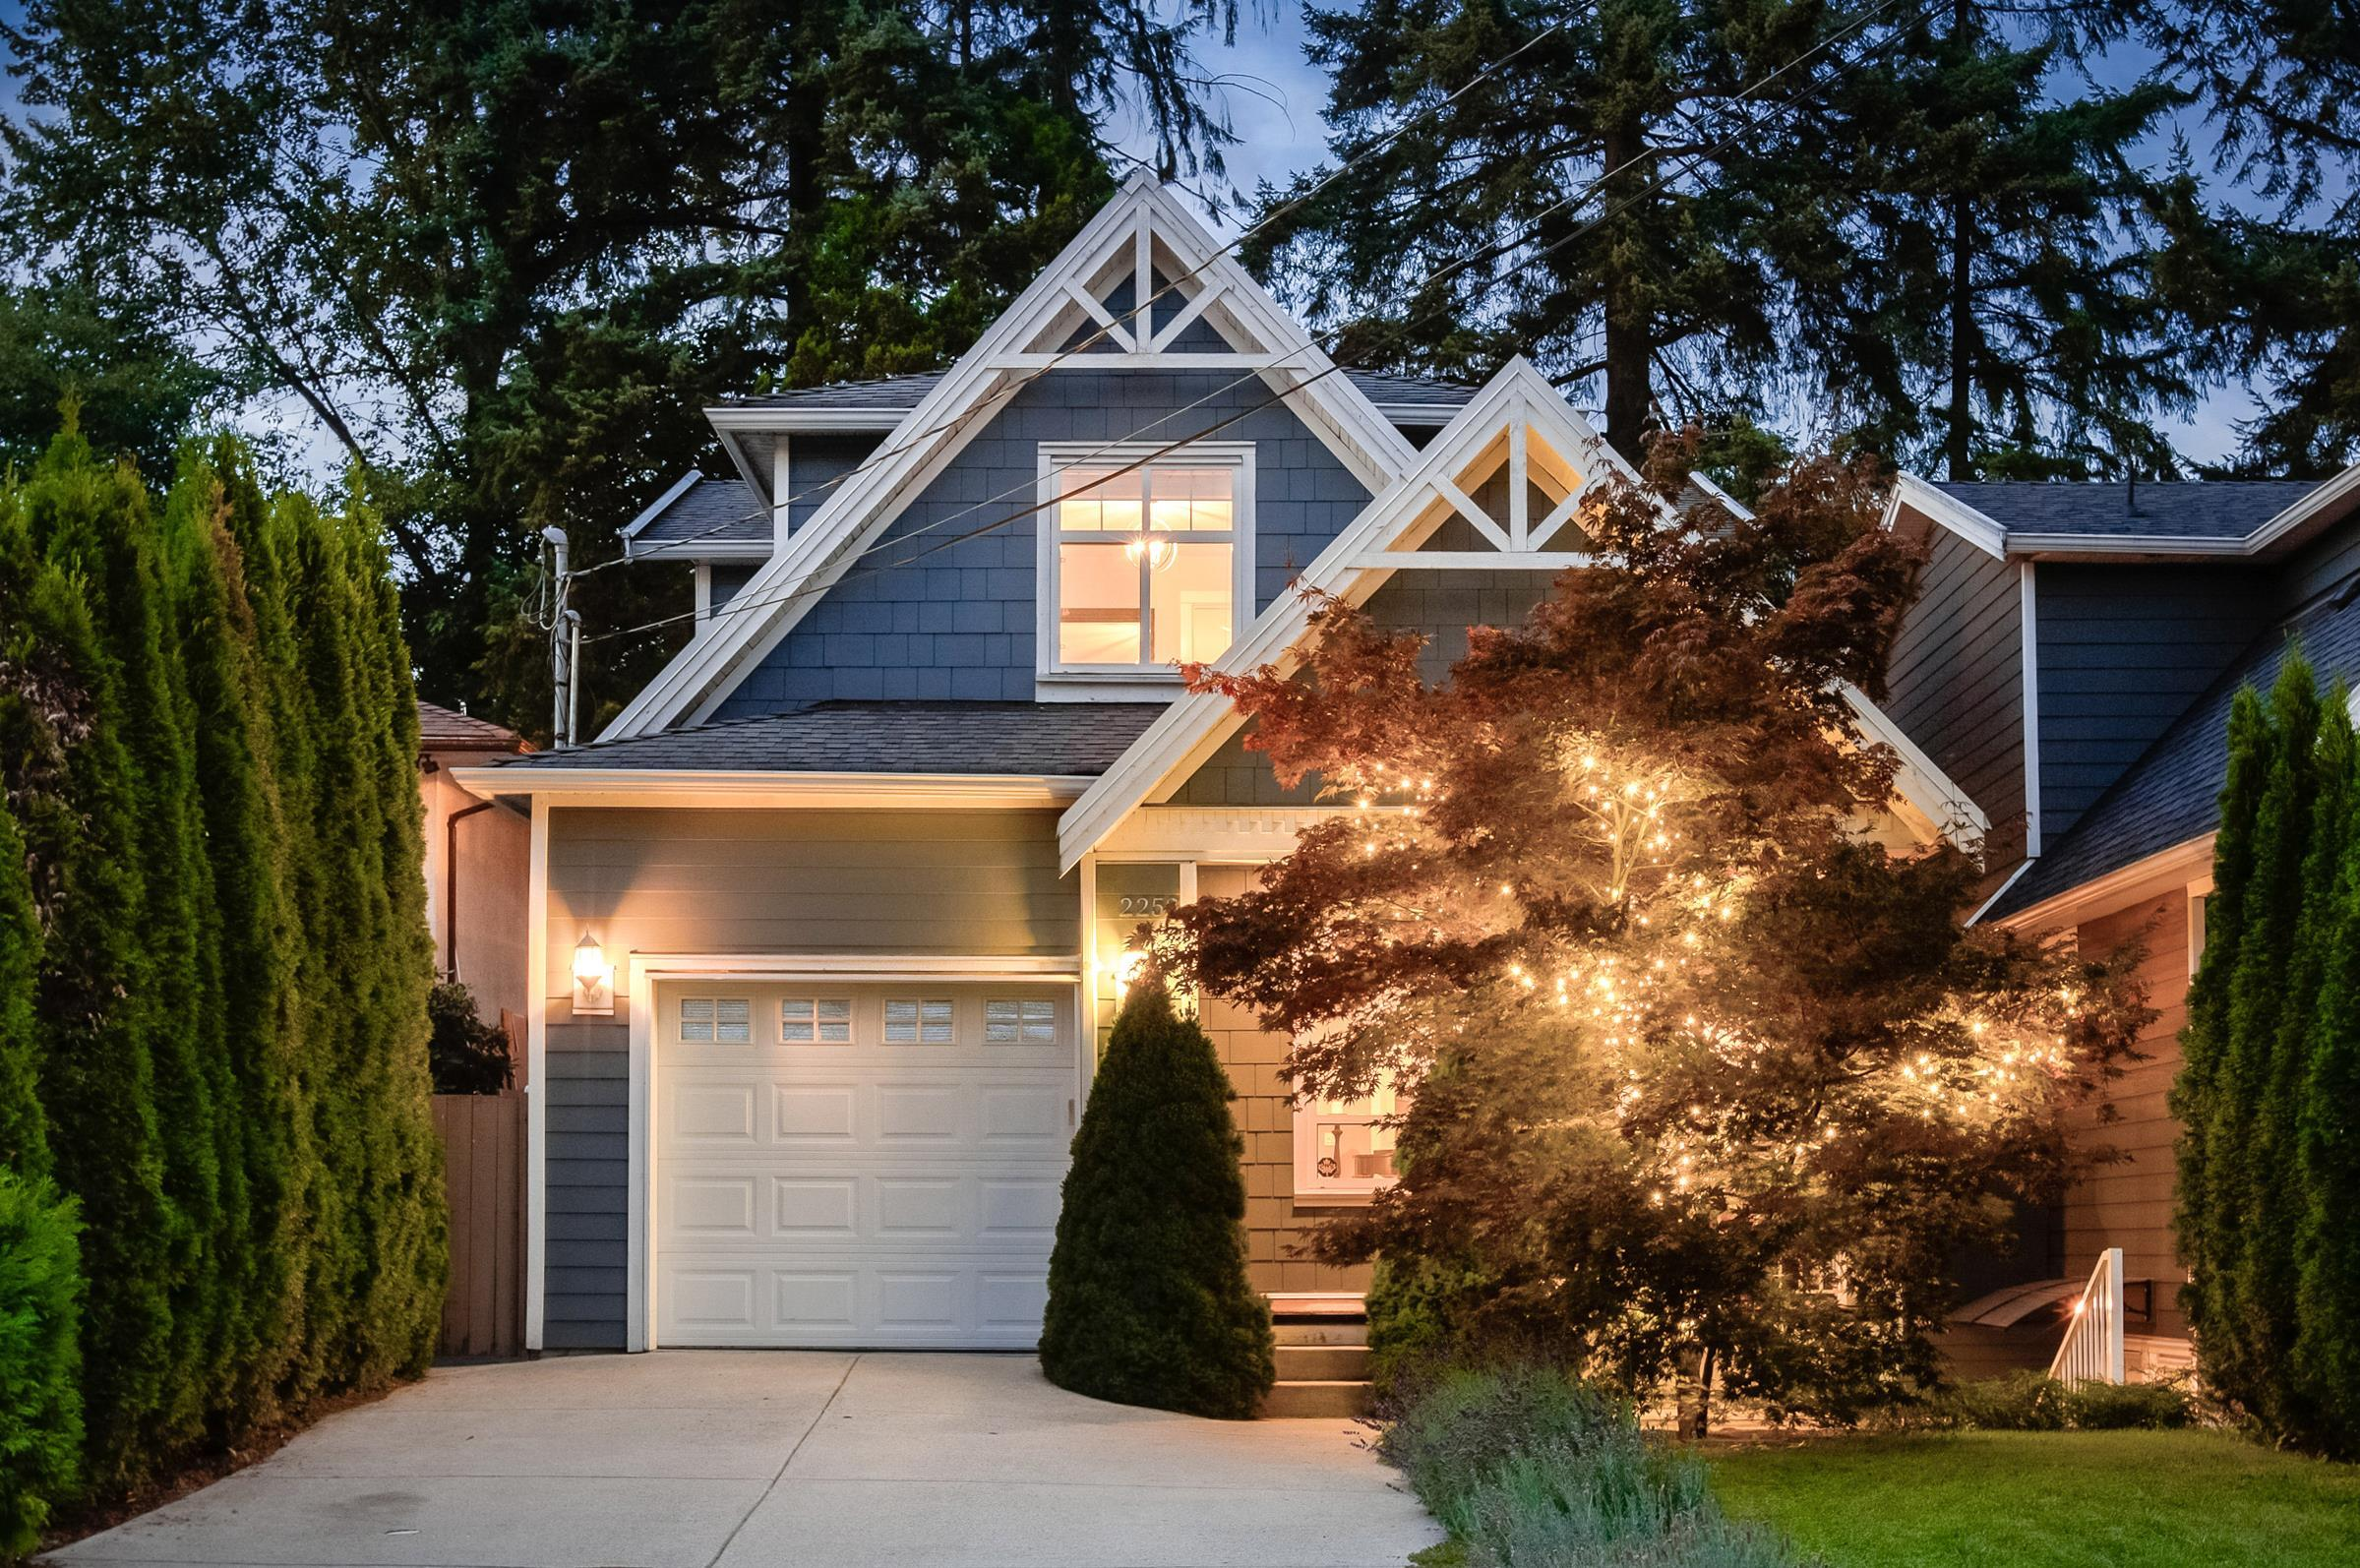 2258 WINDRIDGE DRIVE - Seymour NV House/Single Family for sale, 5 Bedrooms (R2617156) - #1